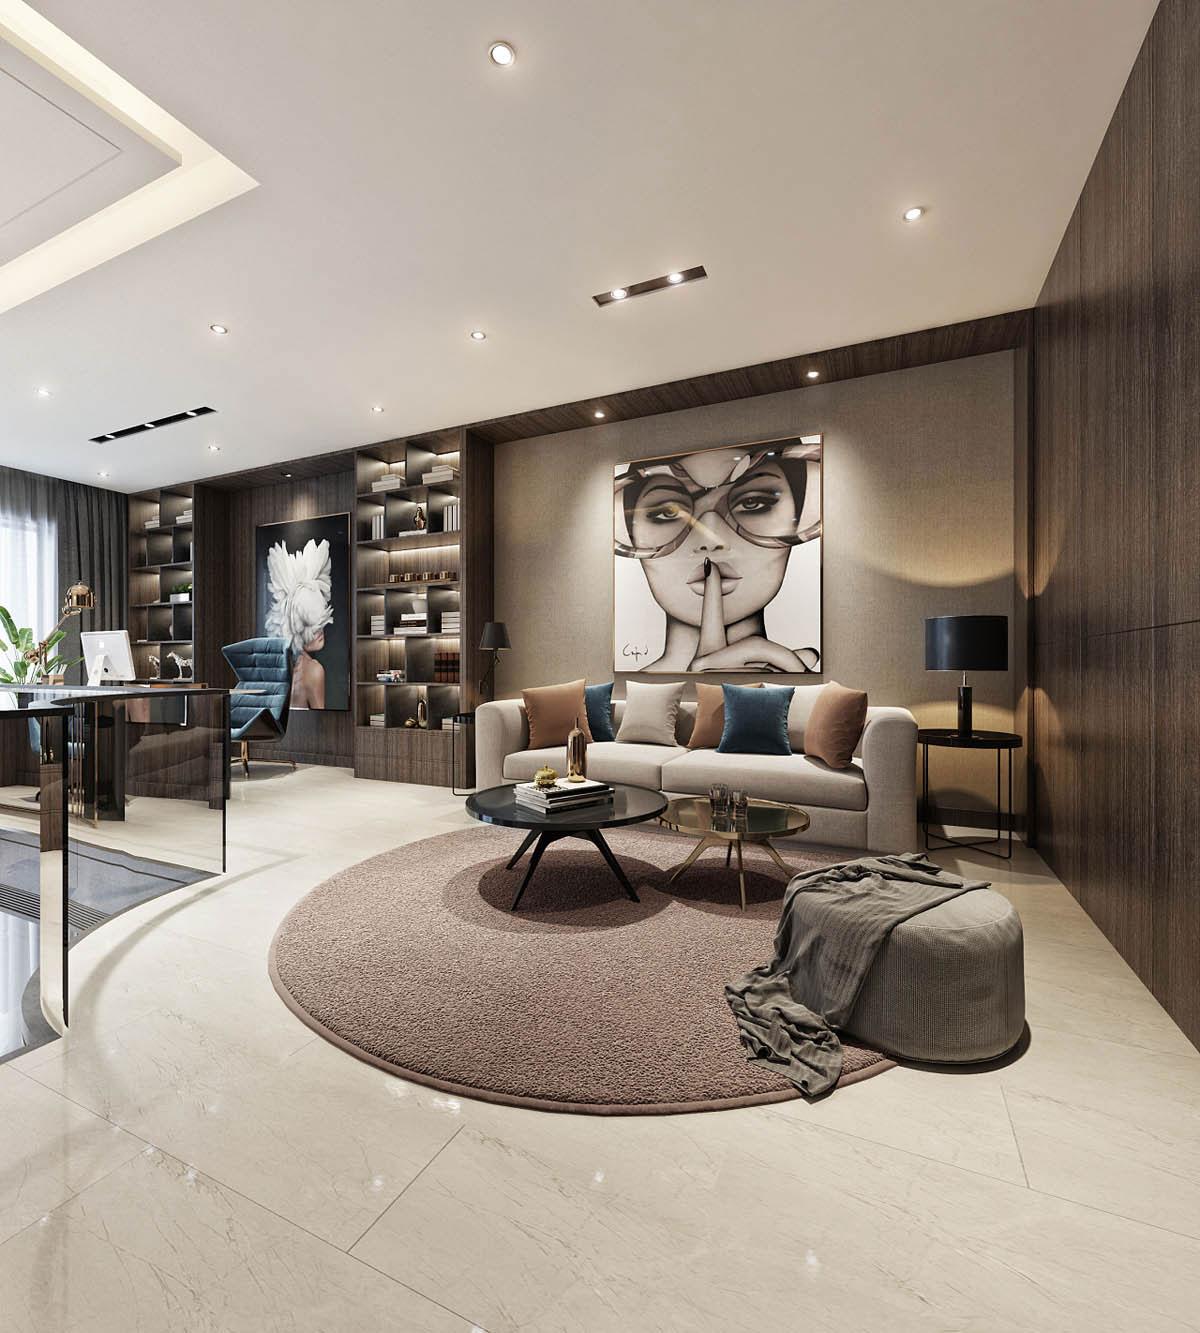 At Home Design: 2 نمونه طراحی داخلی خانه های لاکچری و مدرن به سبک آسیایی